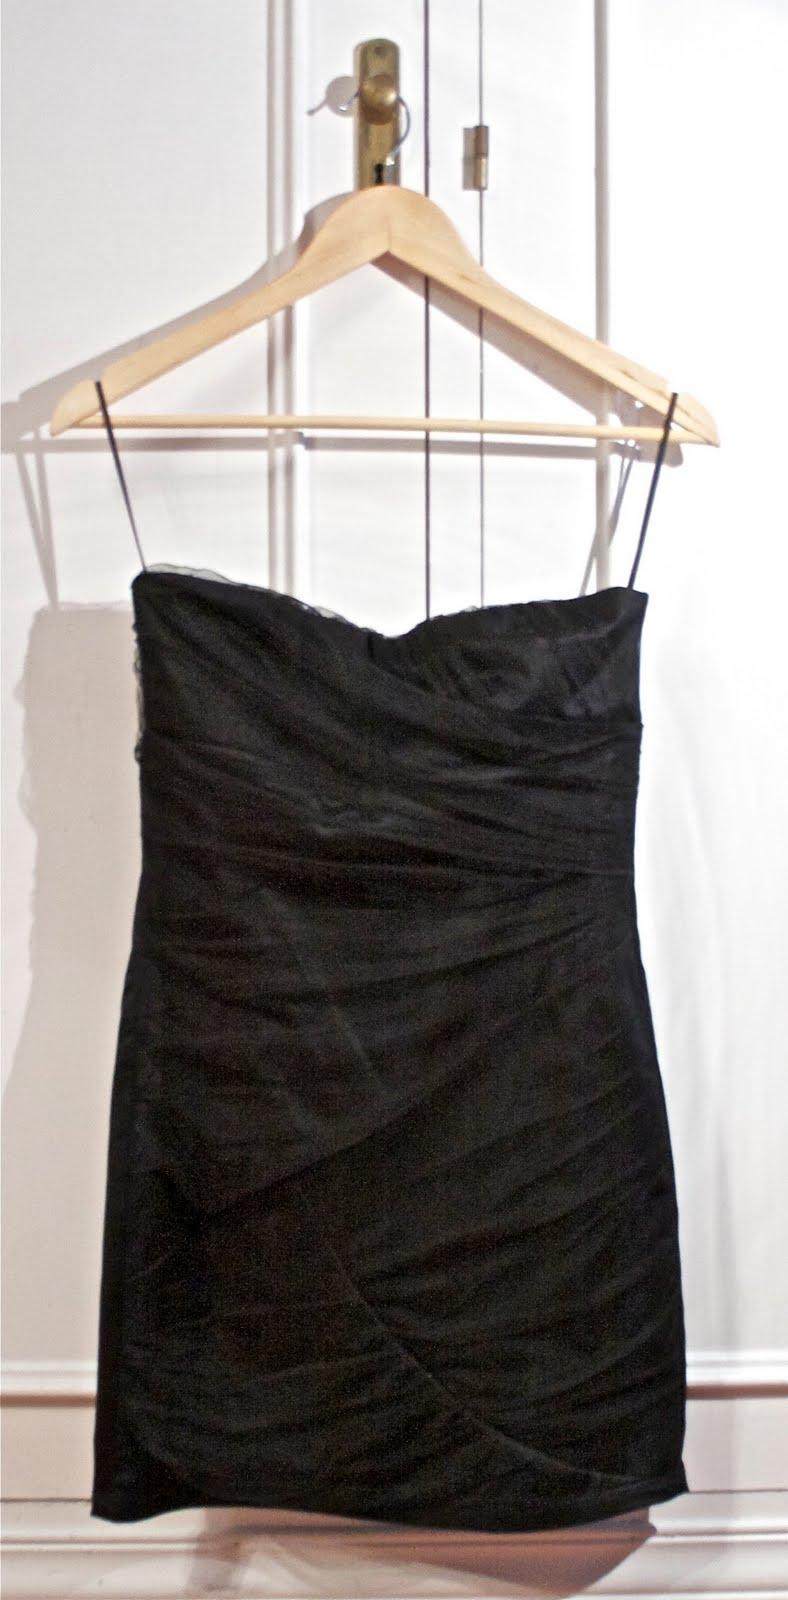 Cómo customizar un vestido de noche de Zara-91-crimenesdelamoda